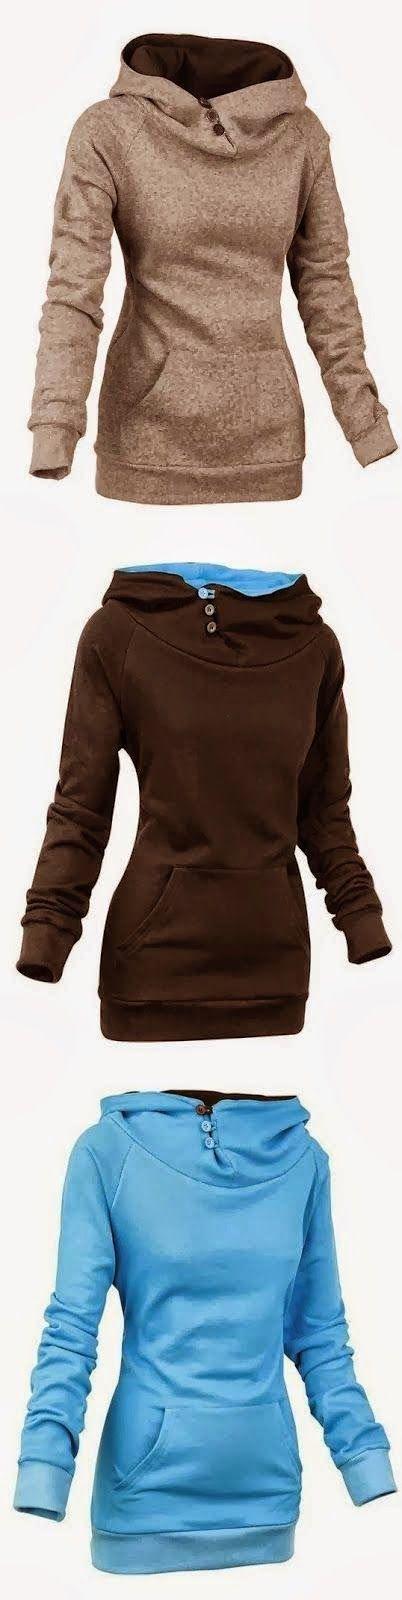 Comfortable Full Sleeve Women's Hoodies